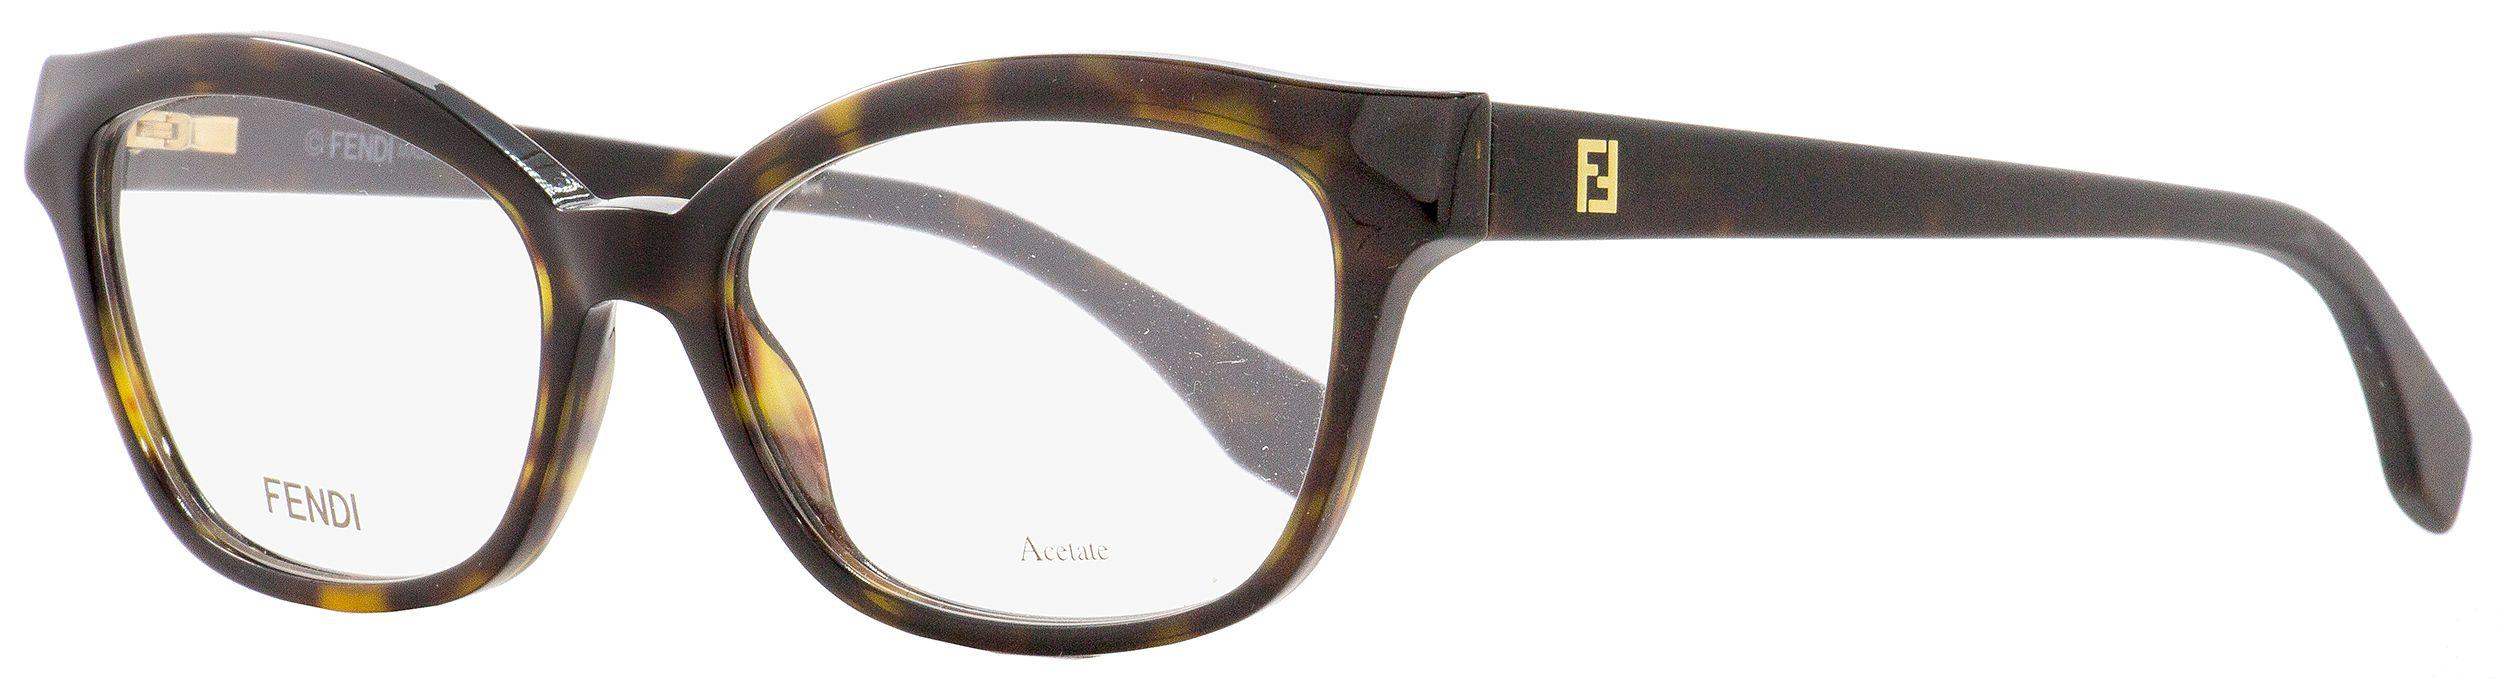 5caab896b96 Lyst - Fendi Oval Eyeglasses Ff0046 086 Havana Shiny matte 52mm 046